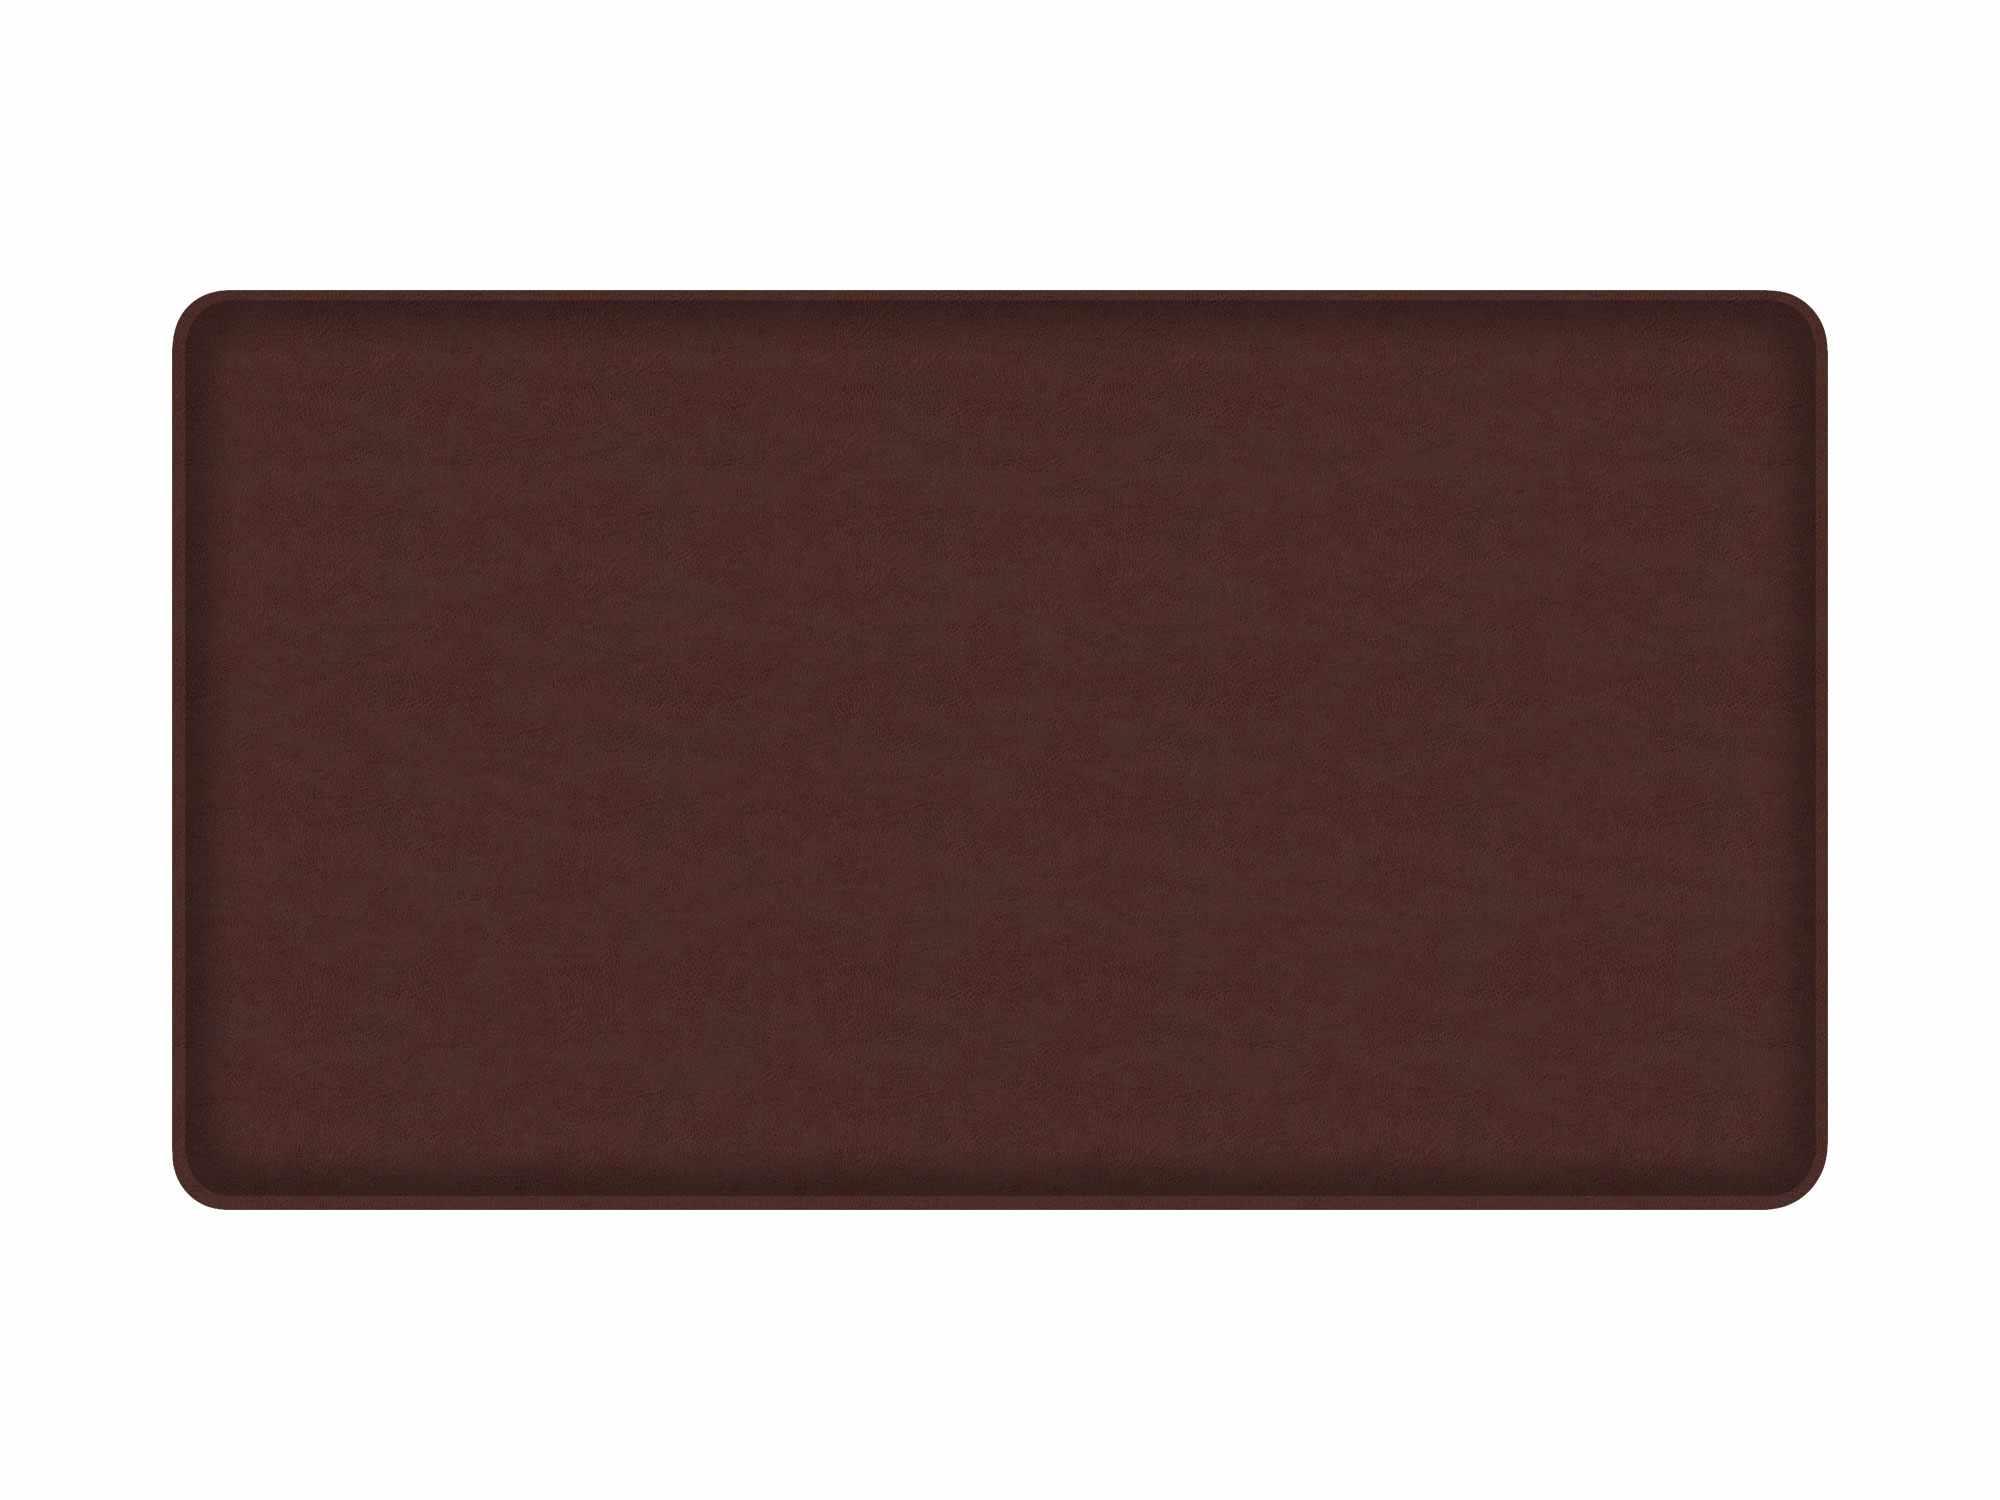 padded kitchen mats primal leather floor